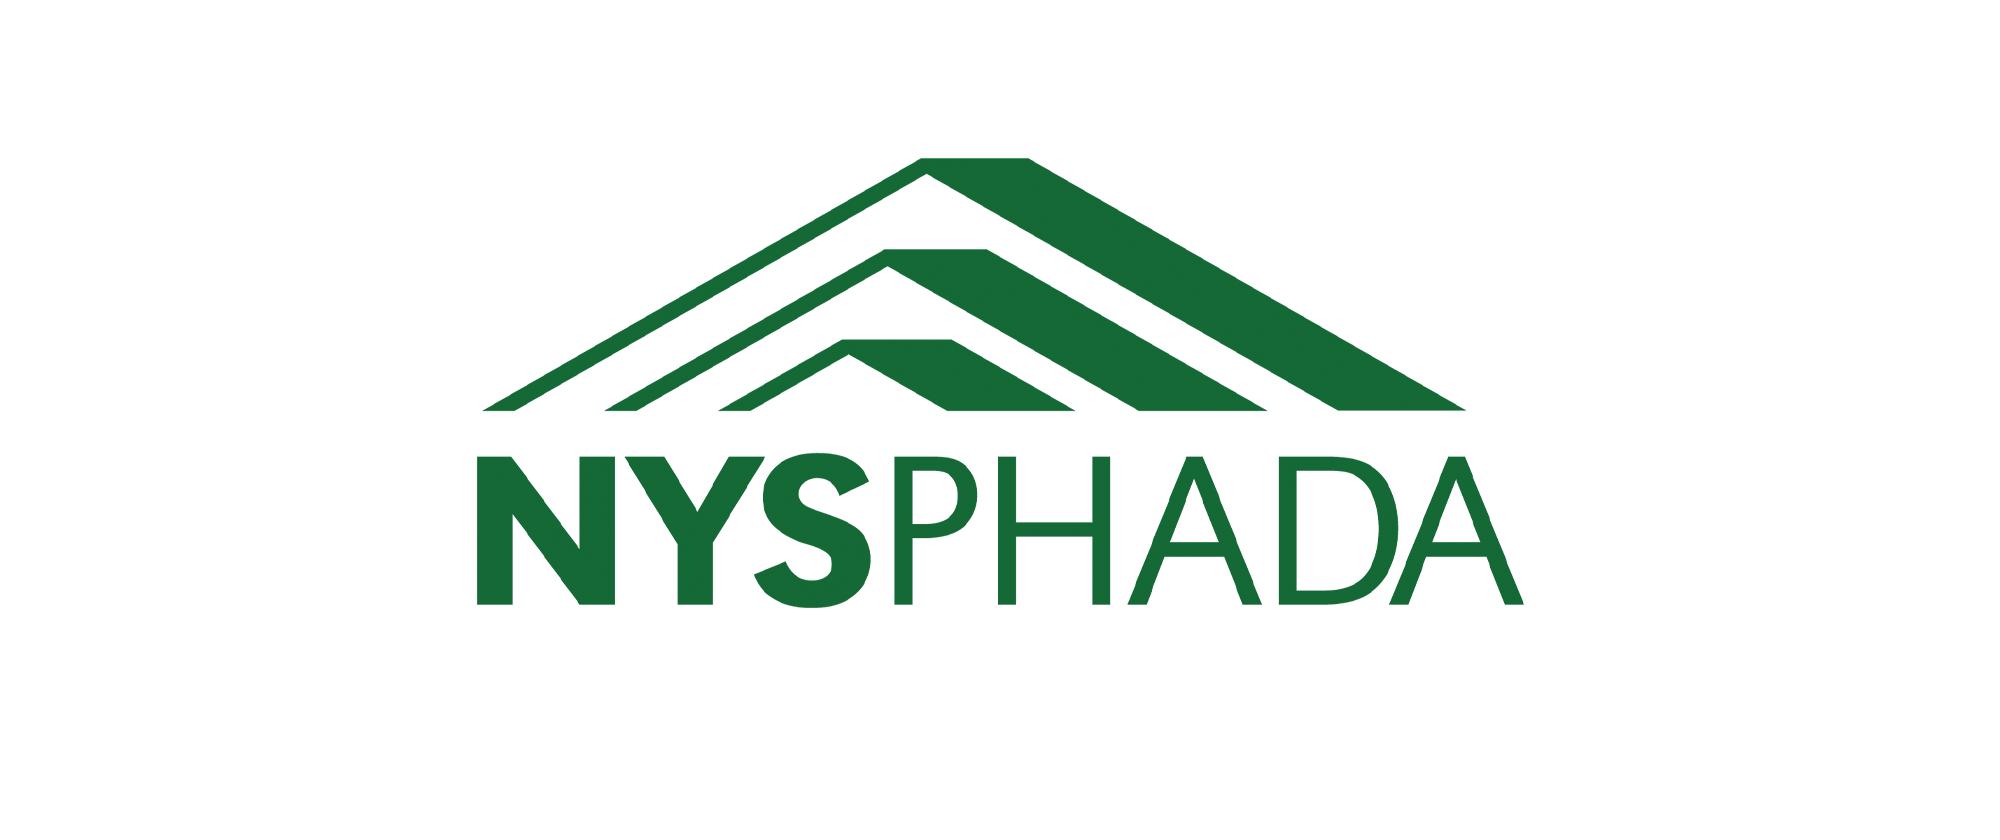 NYSPHADA Logo